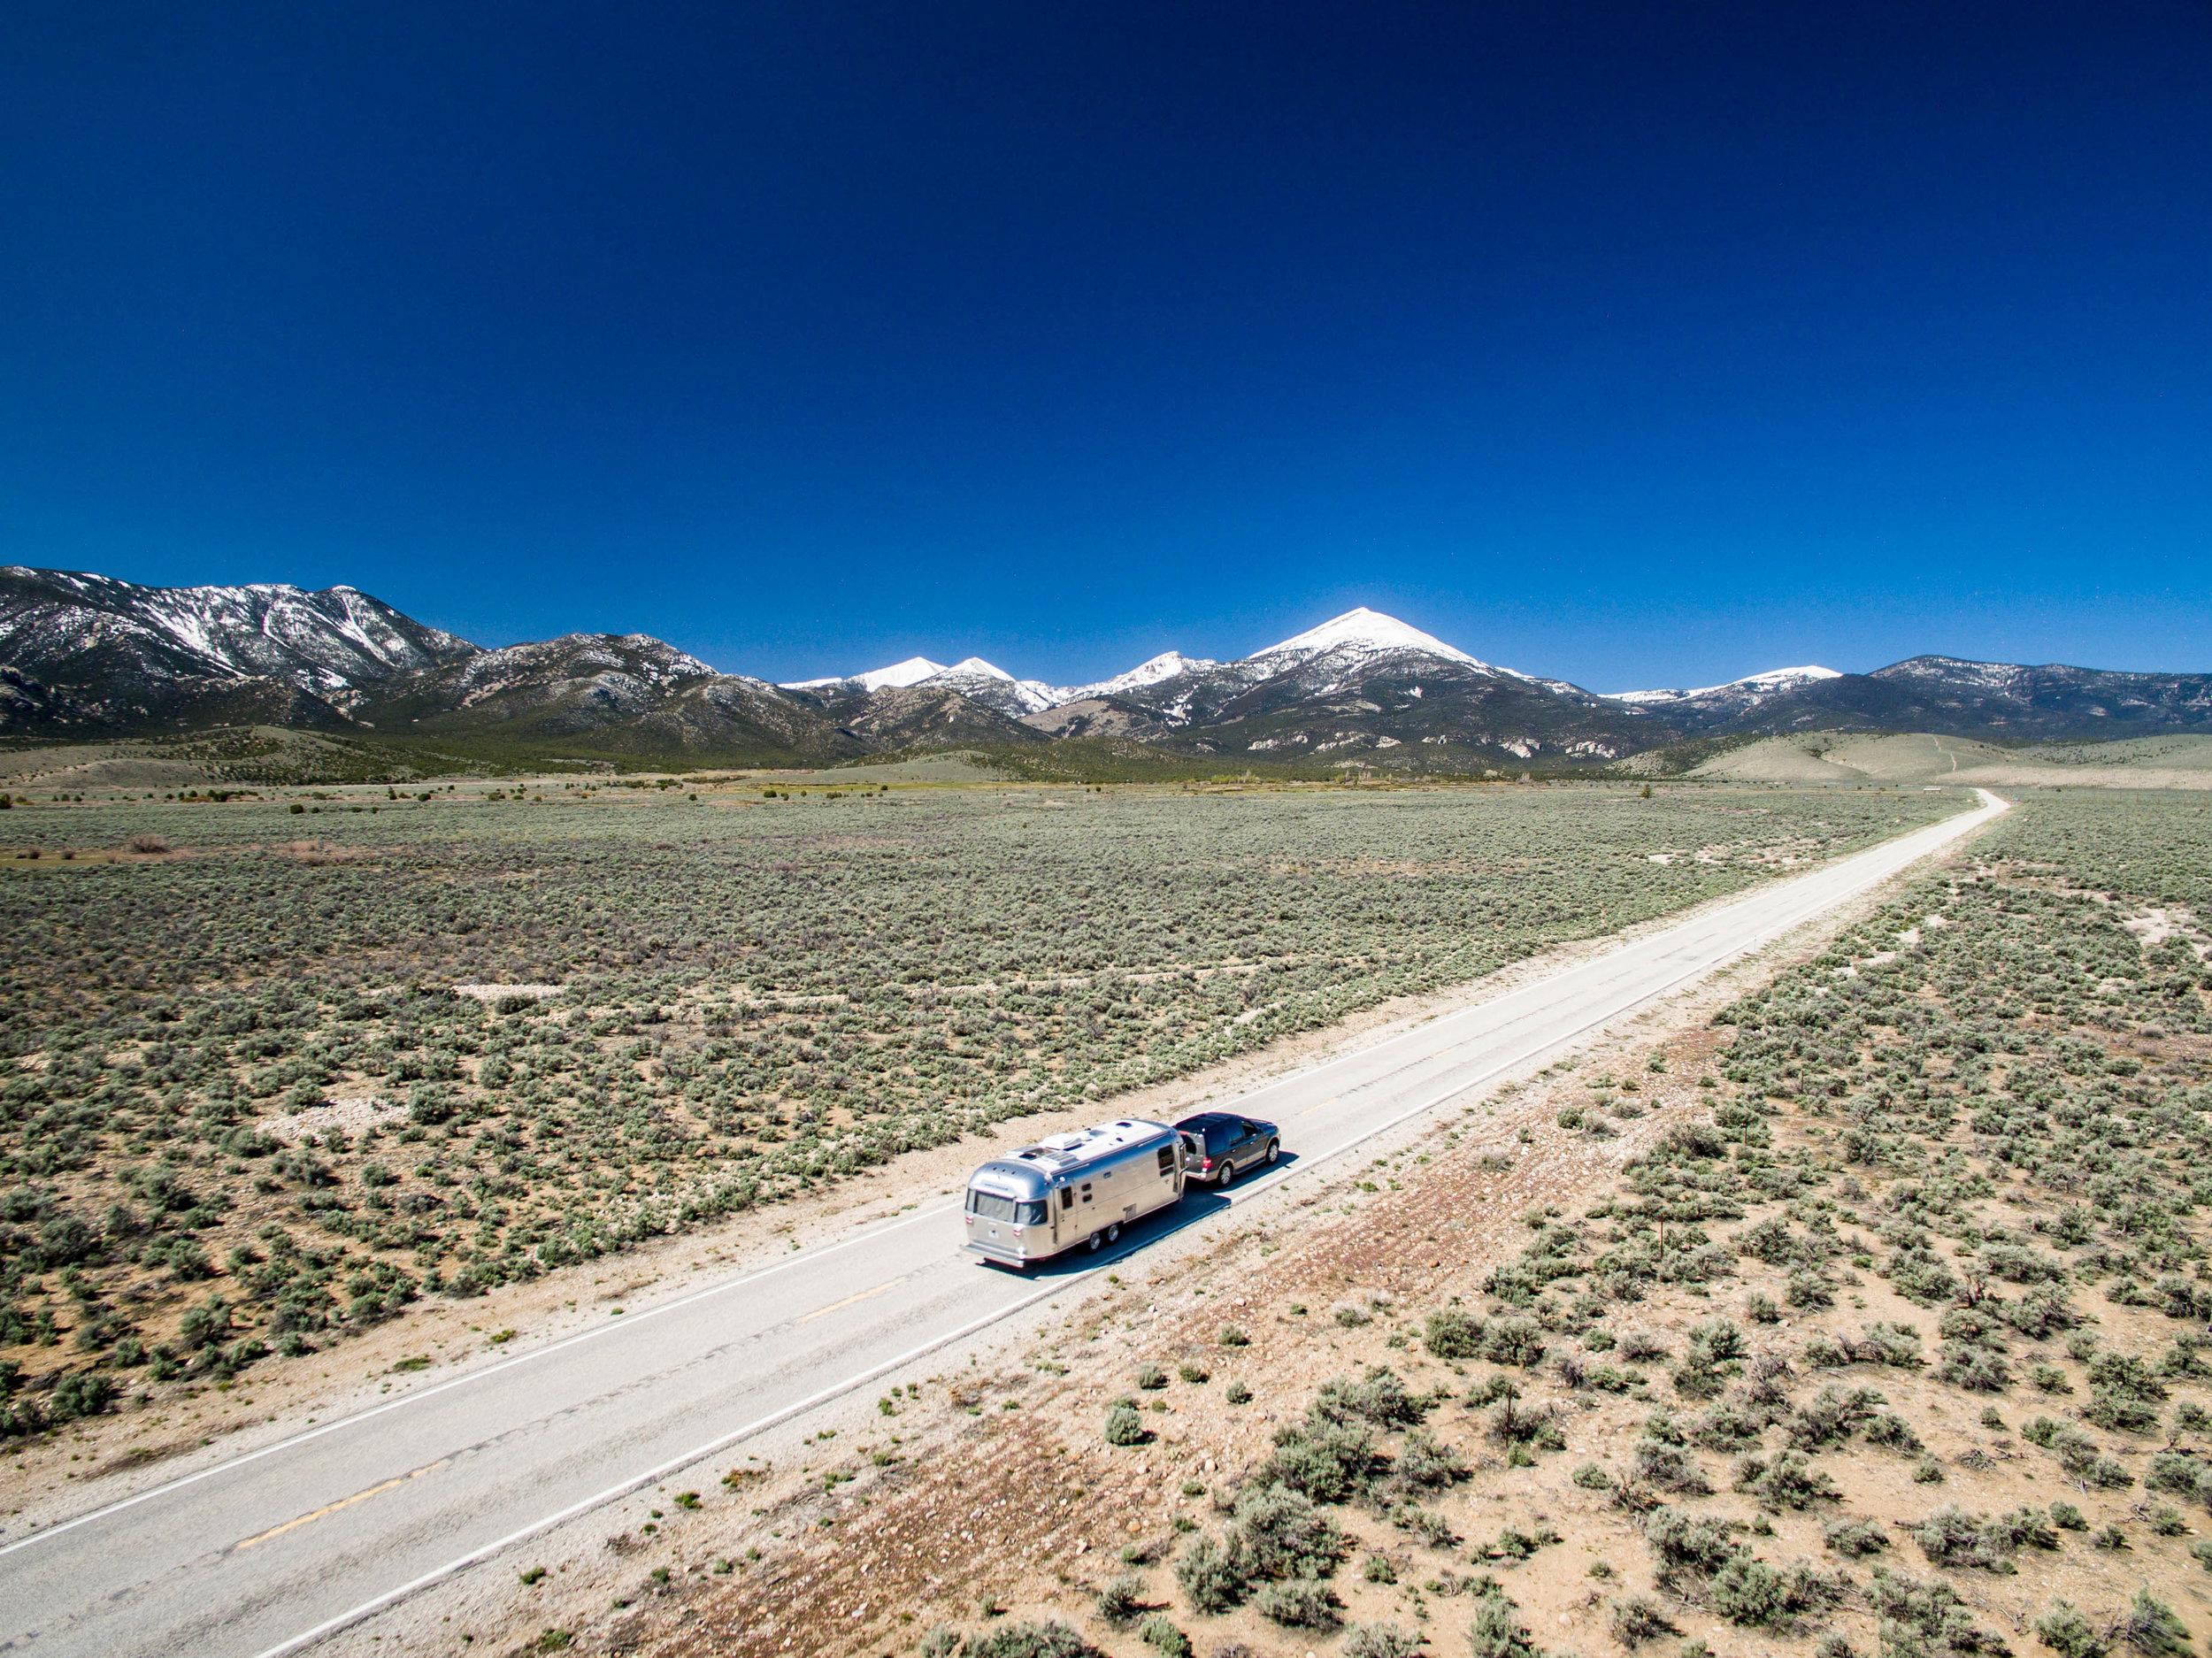 20160417-JI-Great Basin National Park-00030.jpg